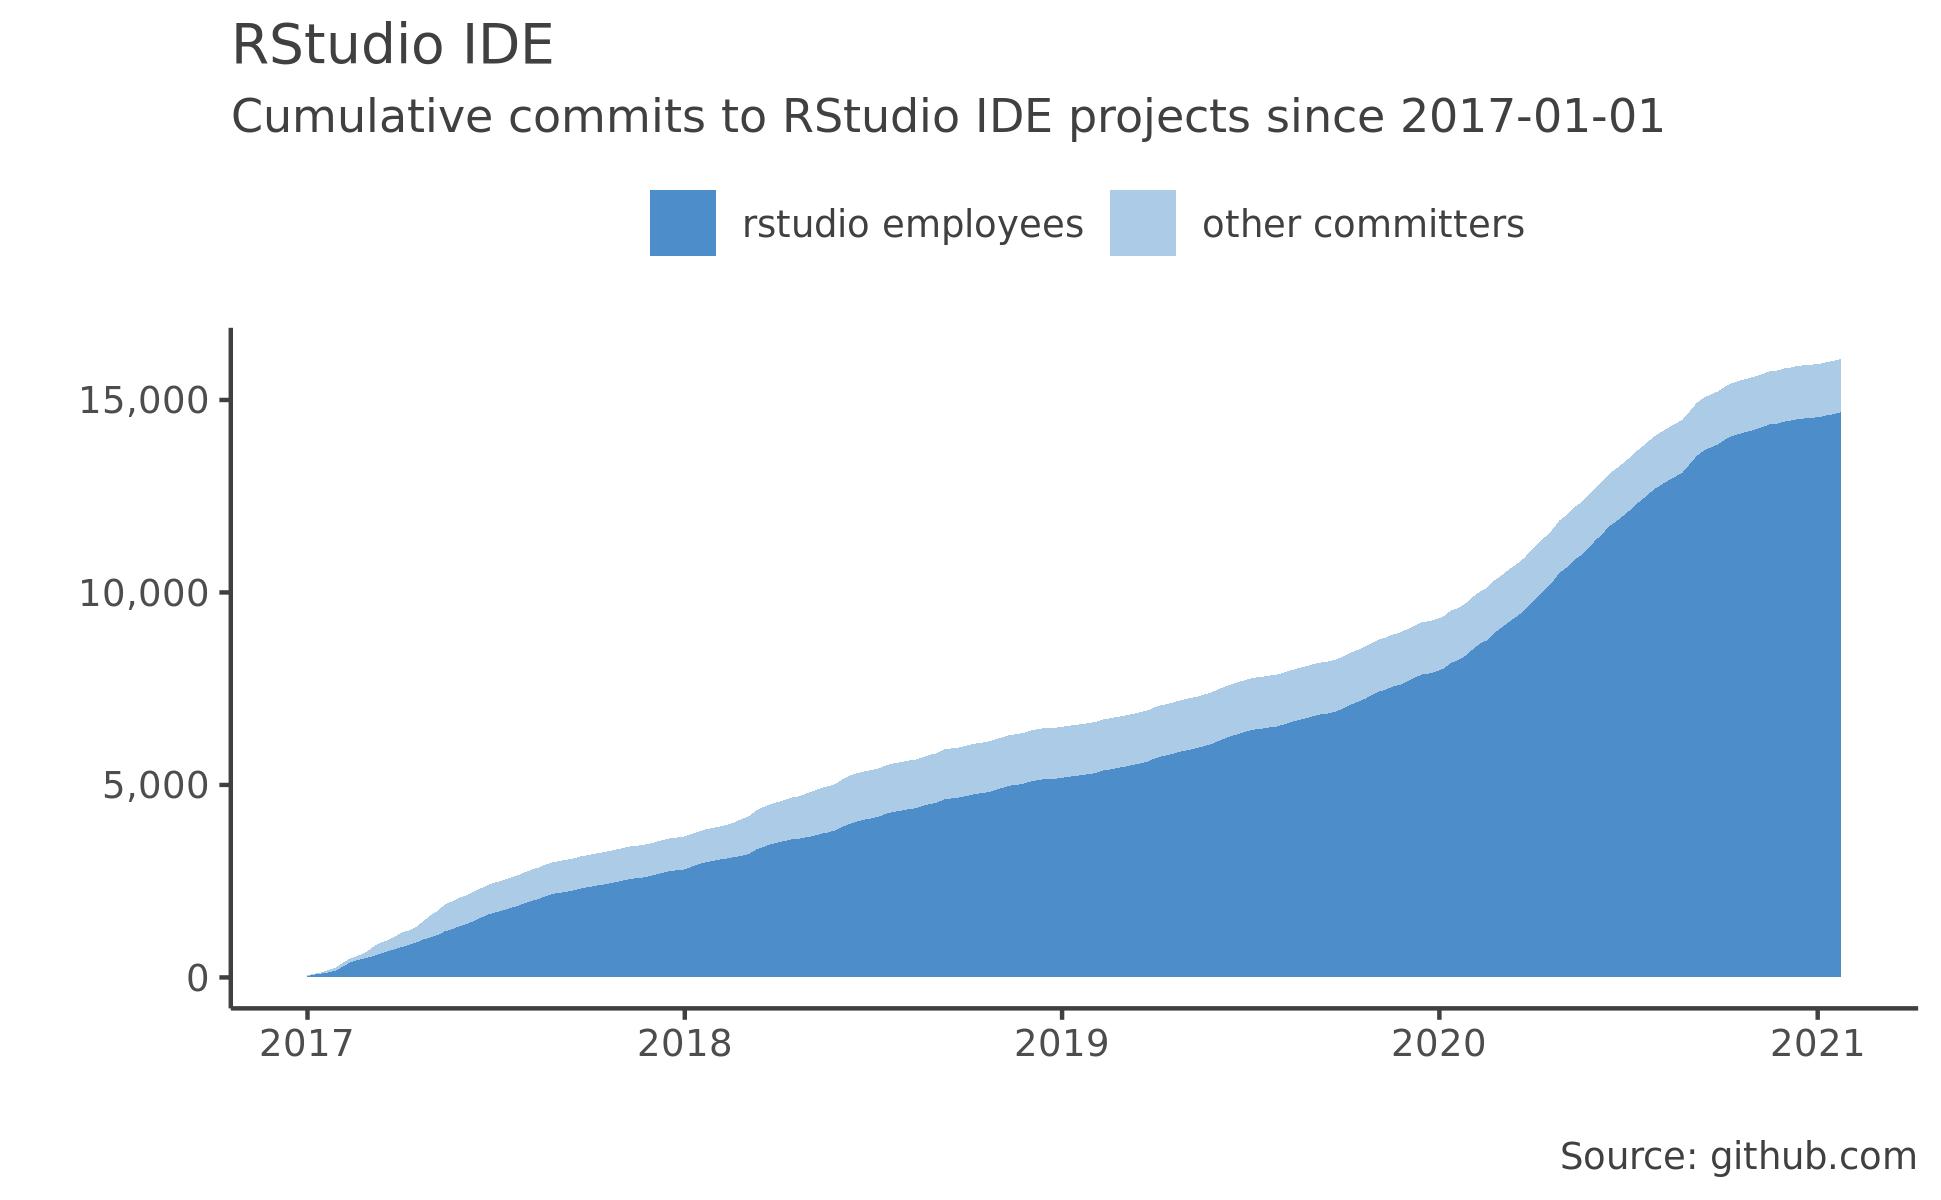 RStudio Integrated Development Environment